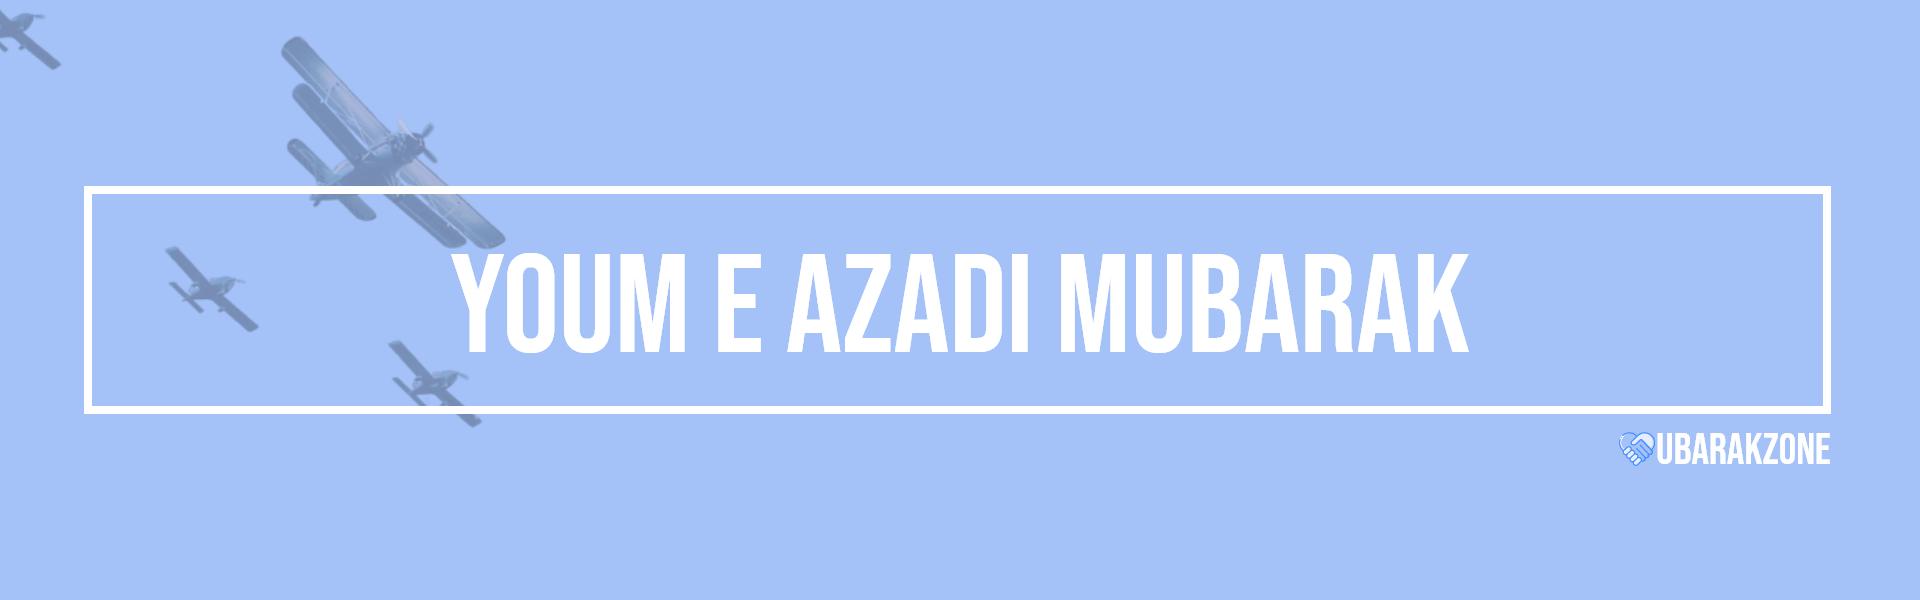 jashn e azadi youm e azadi mubarak wishes messages